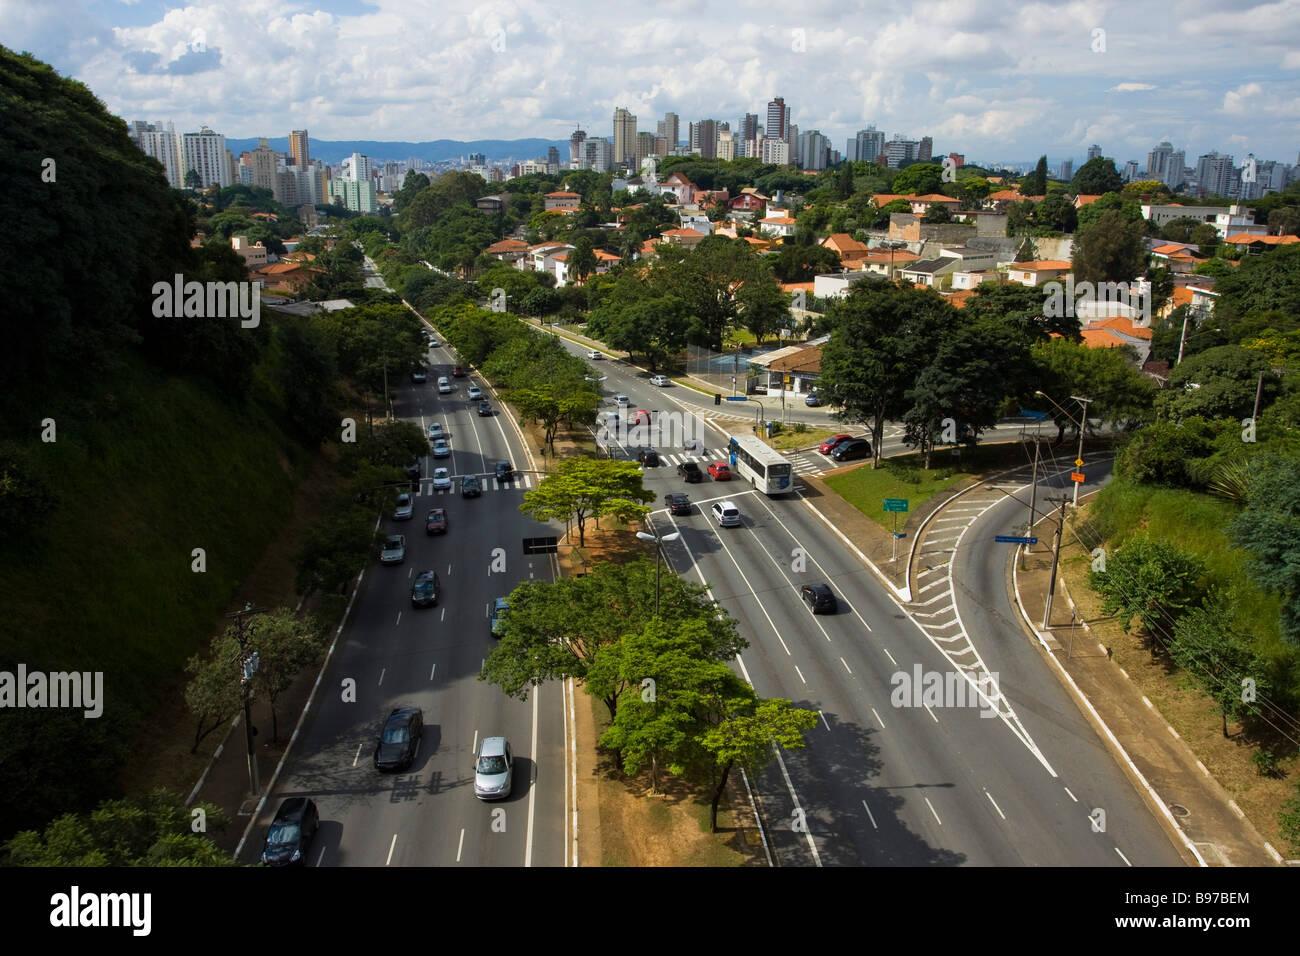 Ville de São Paulo Photo Stock